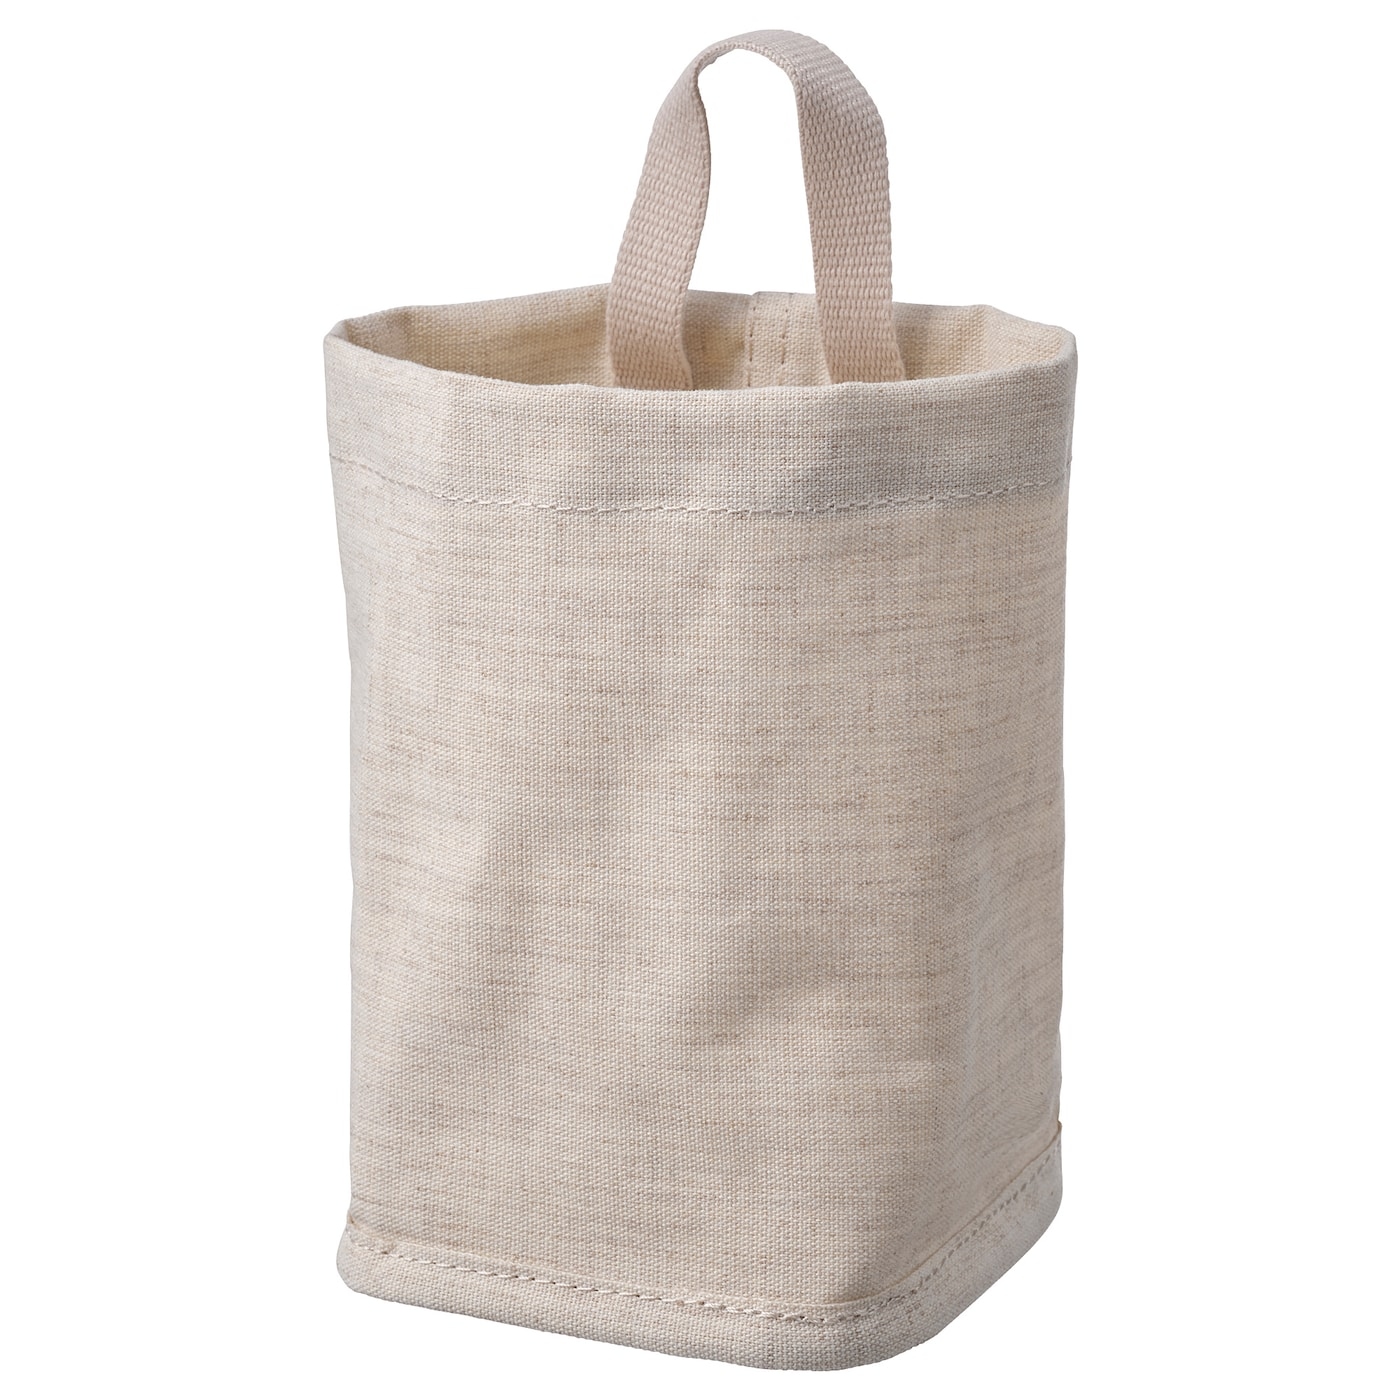 Purrpingla Opbergmand Textiel Beige 10x10x15 Cm Ikea